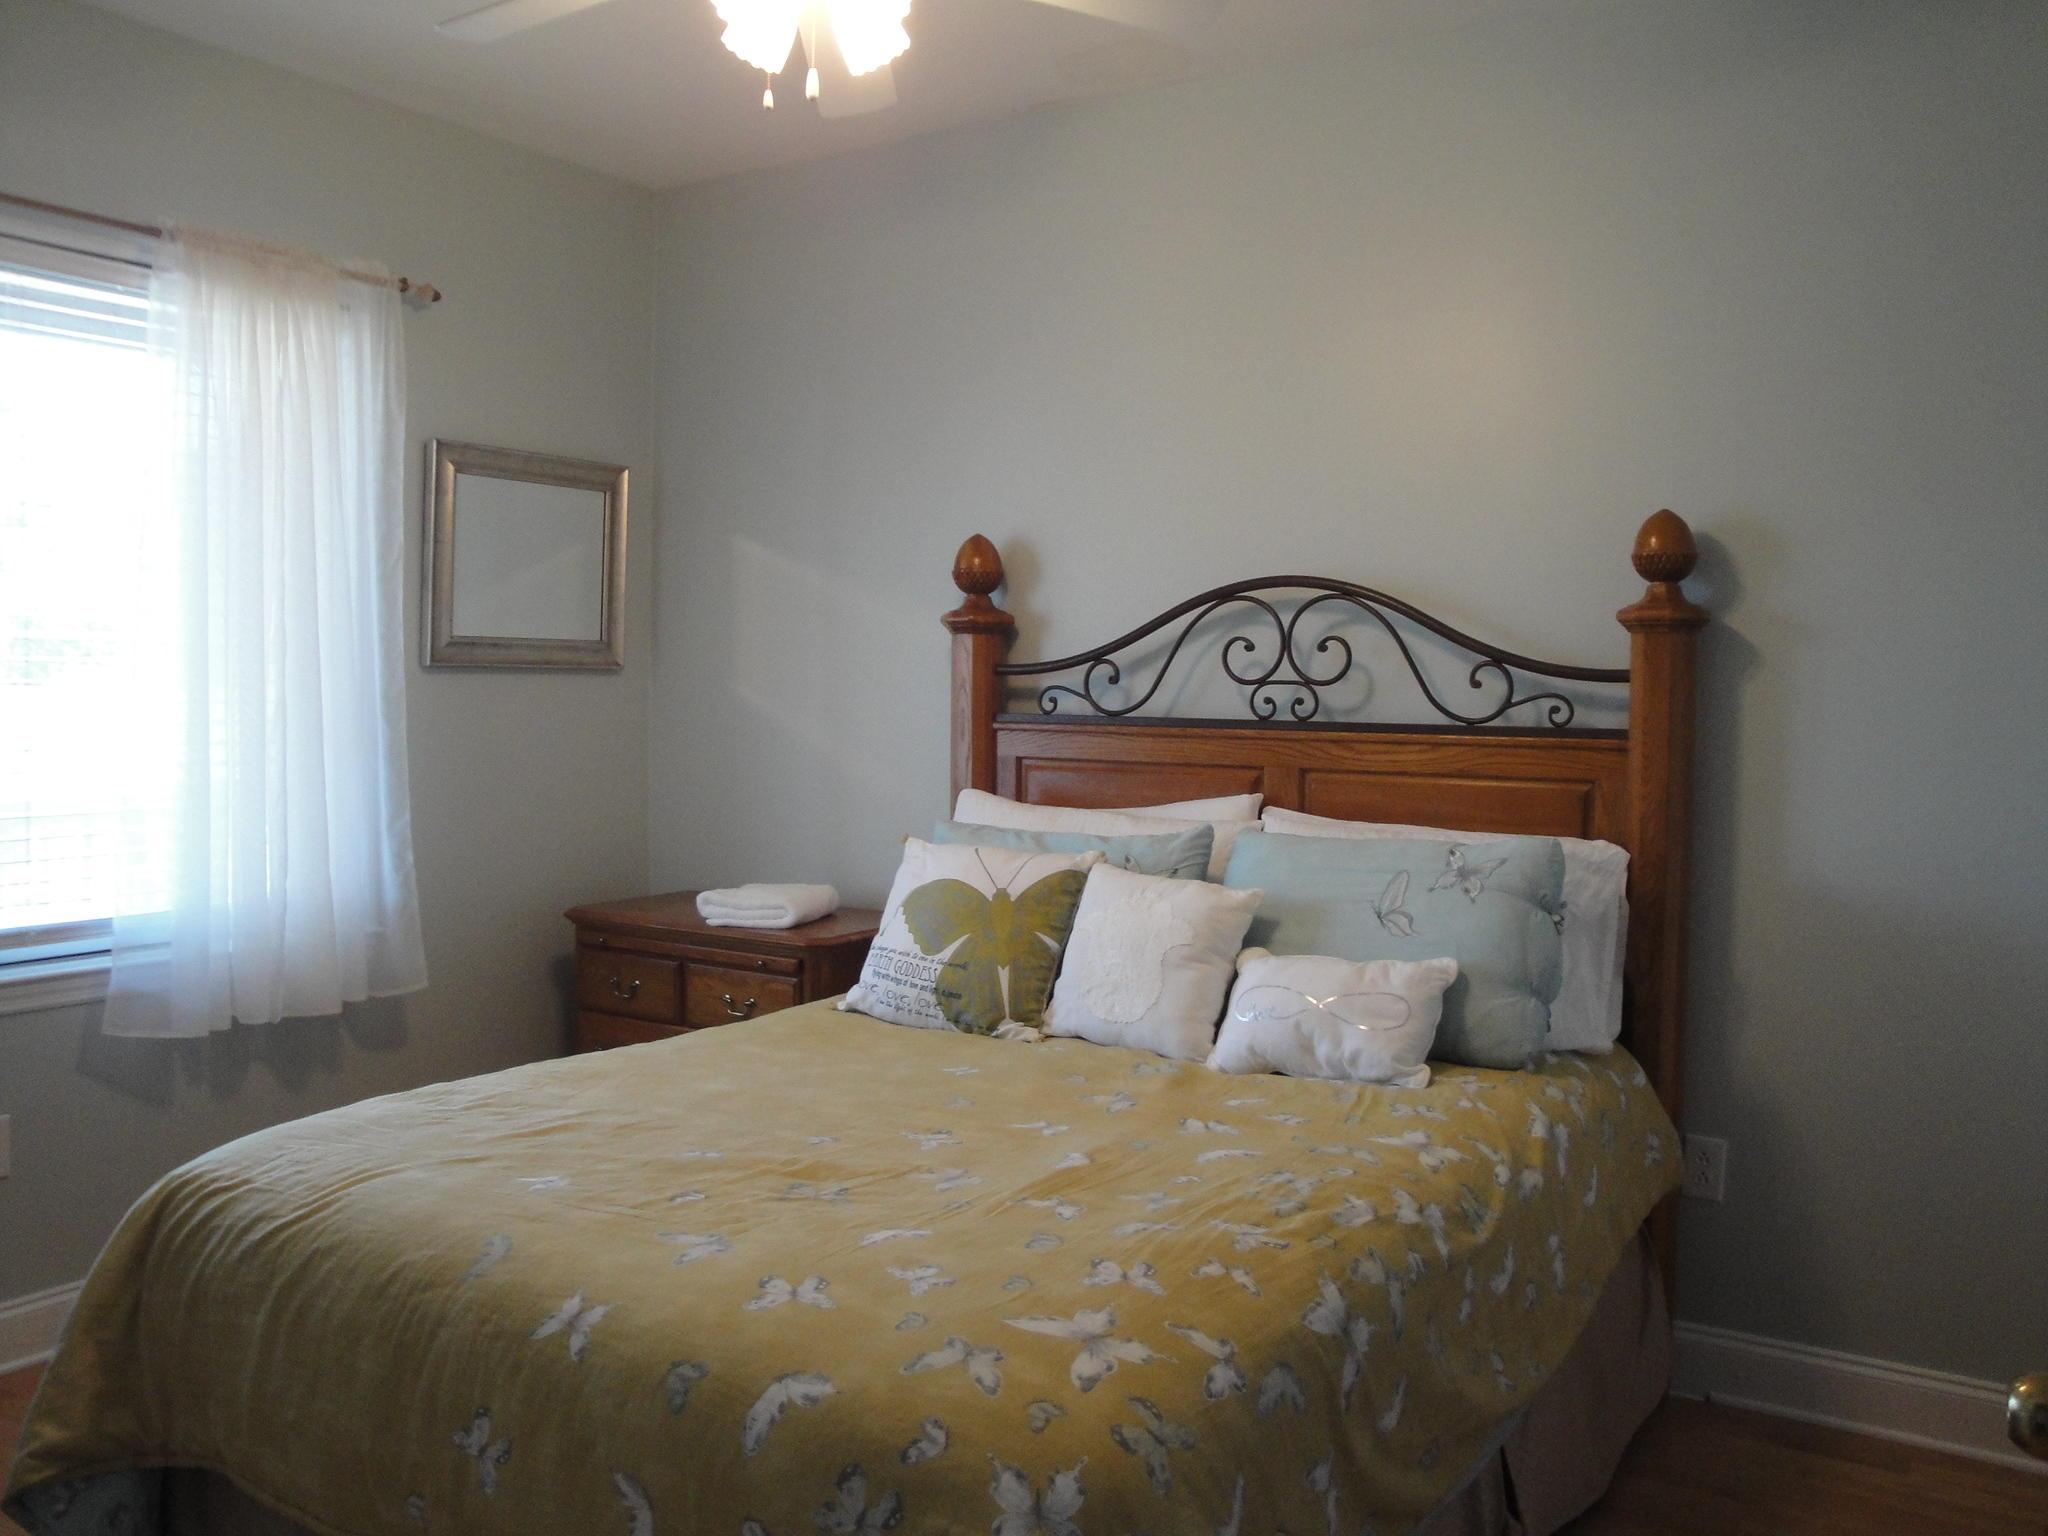 Pier Pointe Villas Homes For Sale - 117 Ashley, Folly Beach, SC - 3